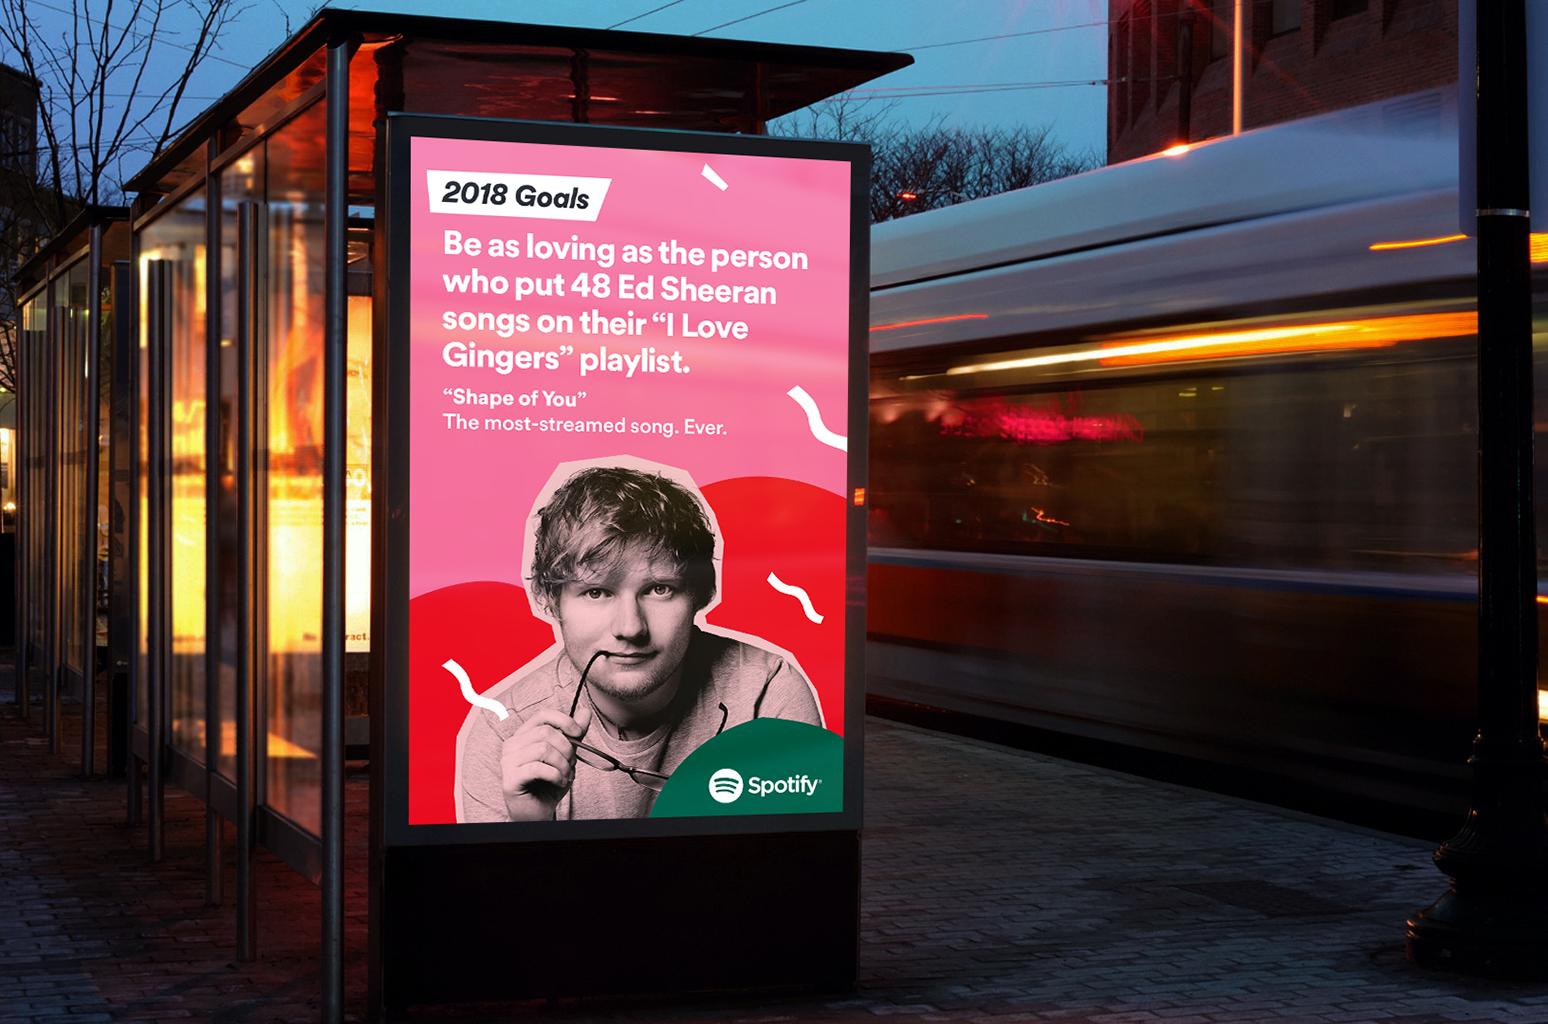 spotify-holiday-ed-sheeran-billboard-1548.jpg